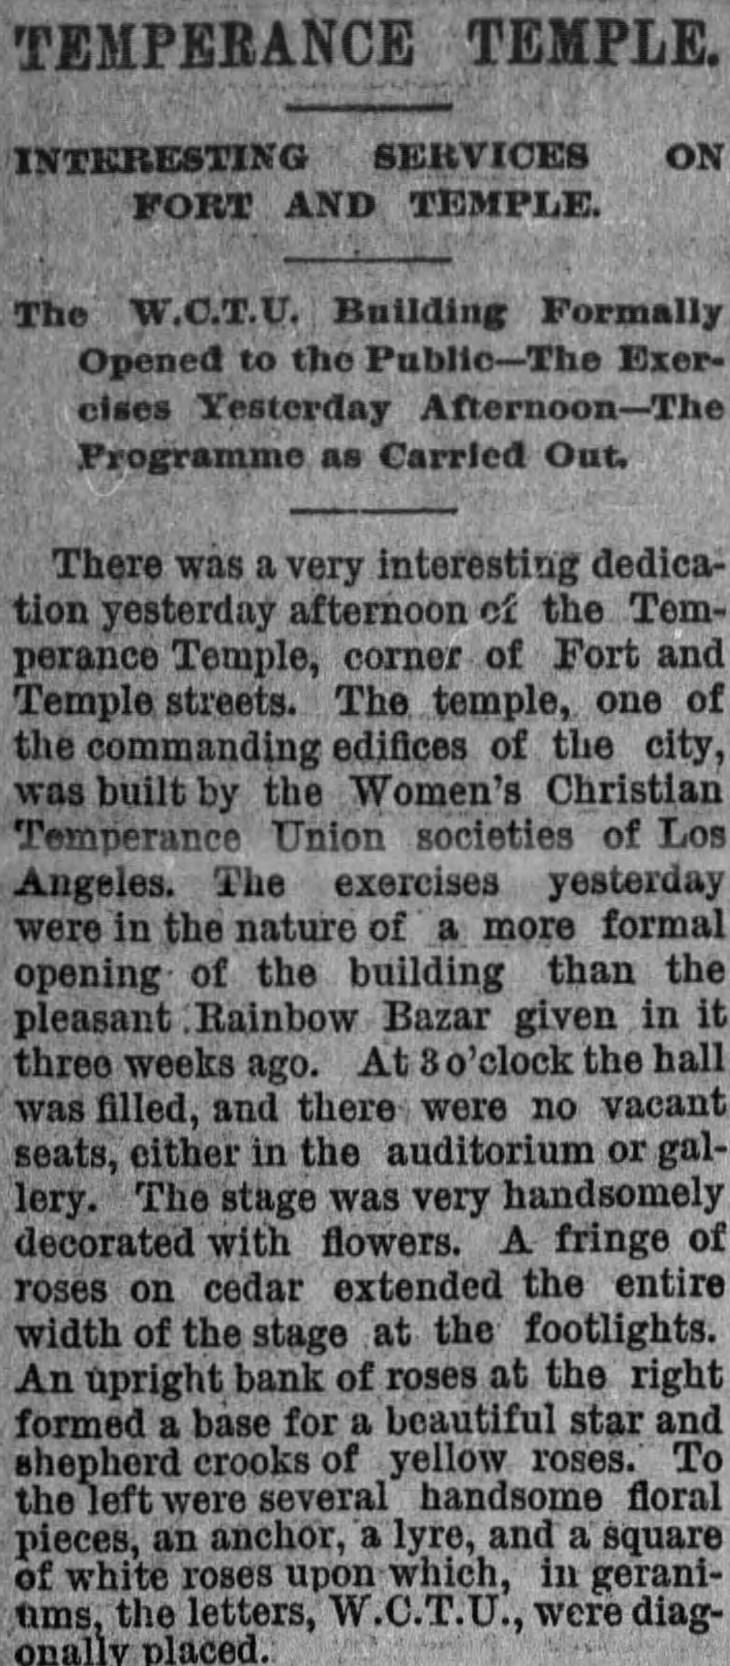 Temperance Temple headline The_Los_Angeles_Times_Mon__Apr_29__1889_ (1).jpg